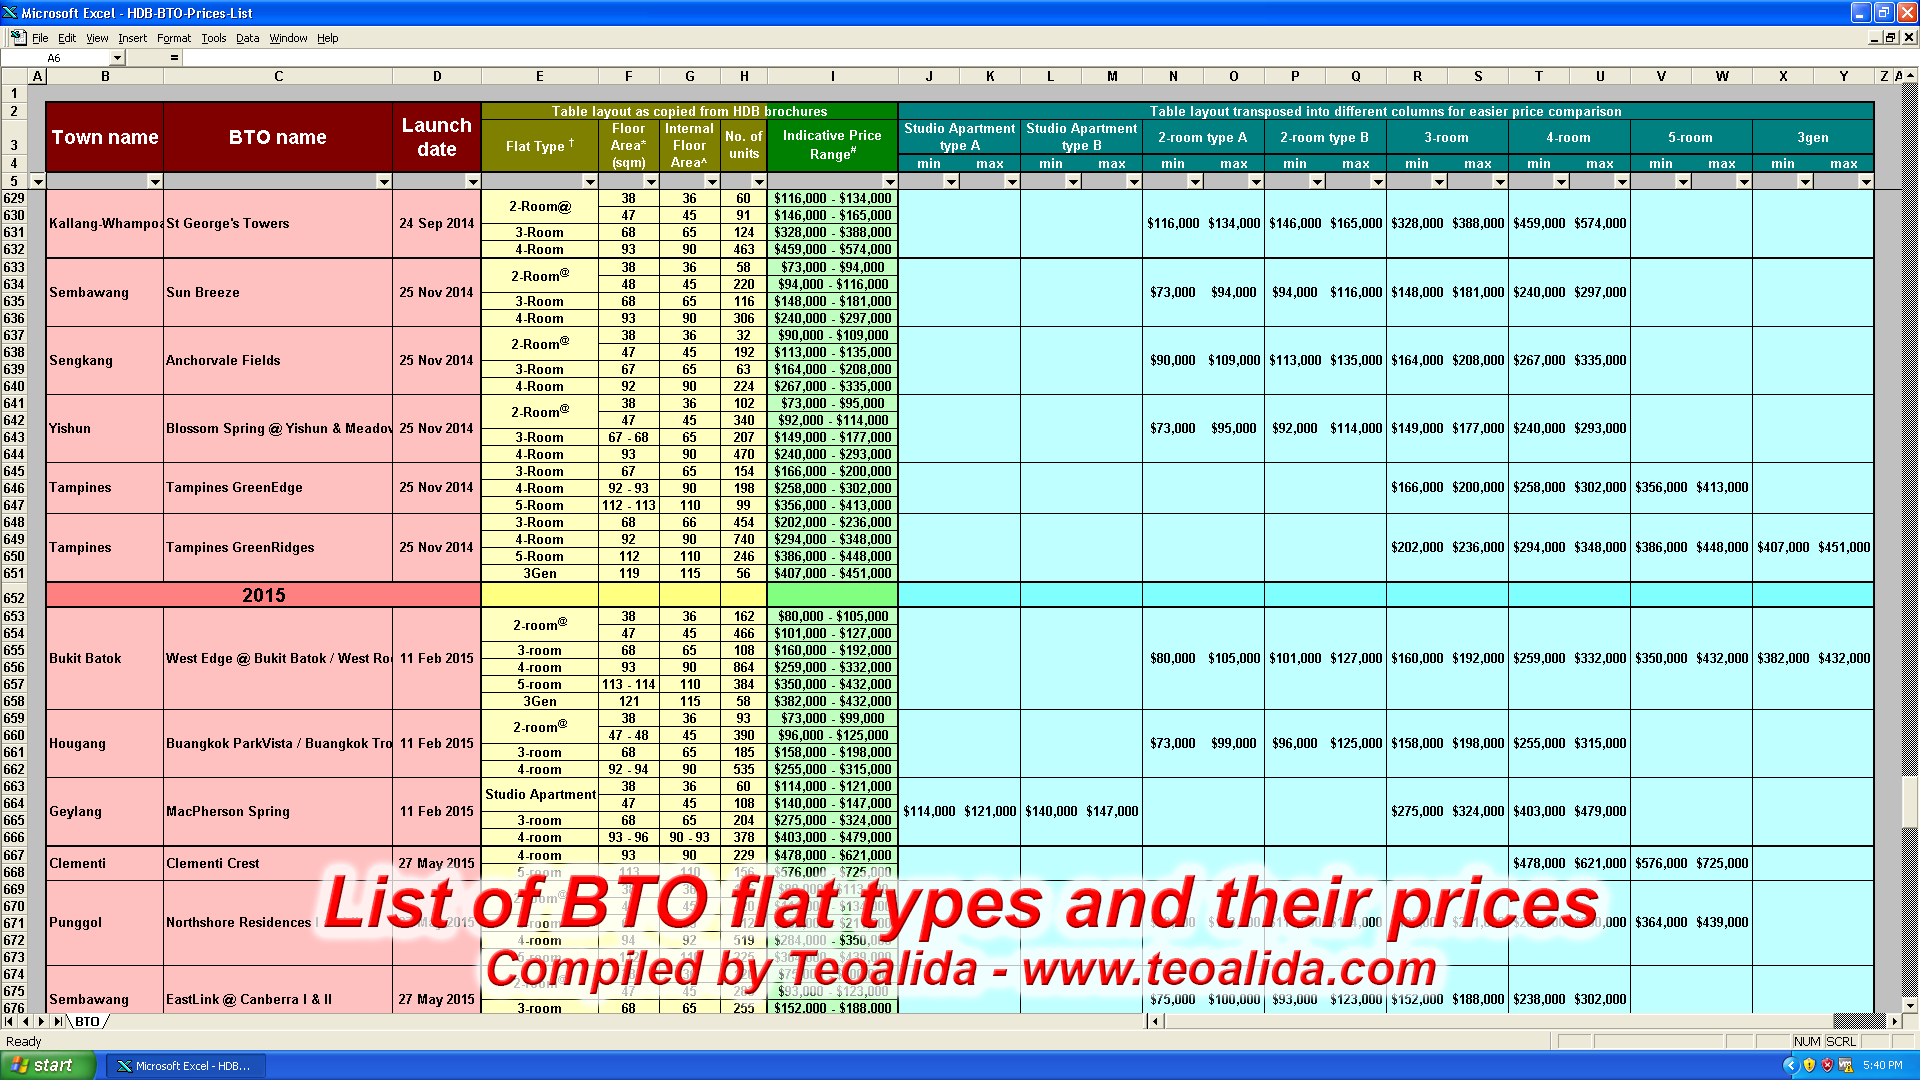 BTO prices 2001-2016